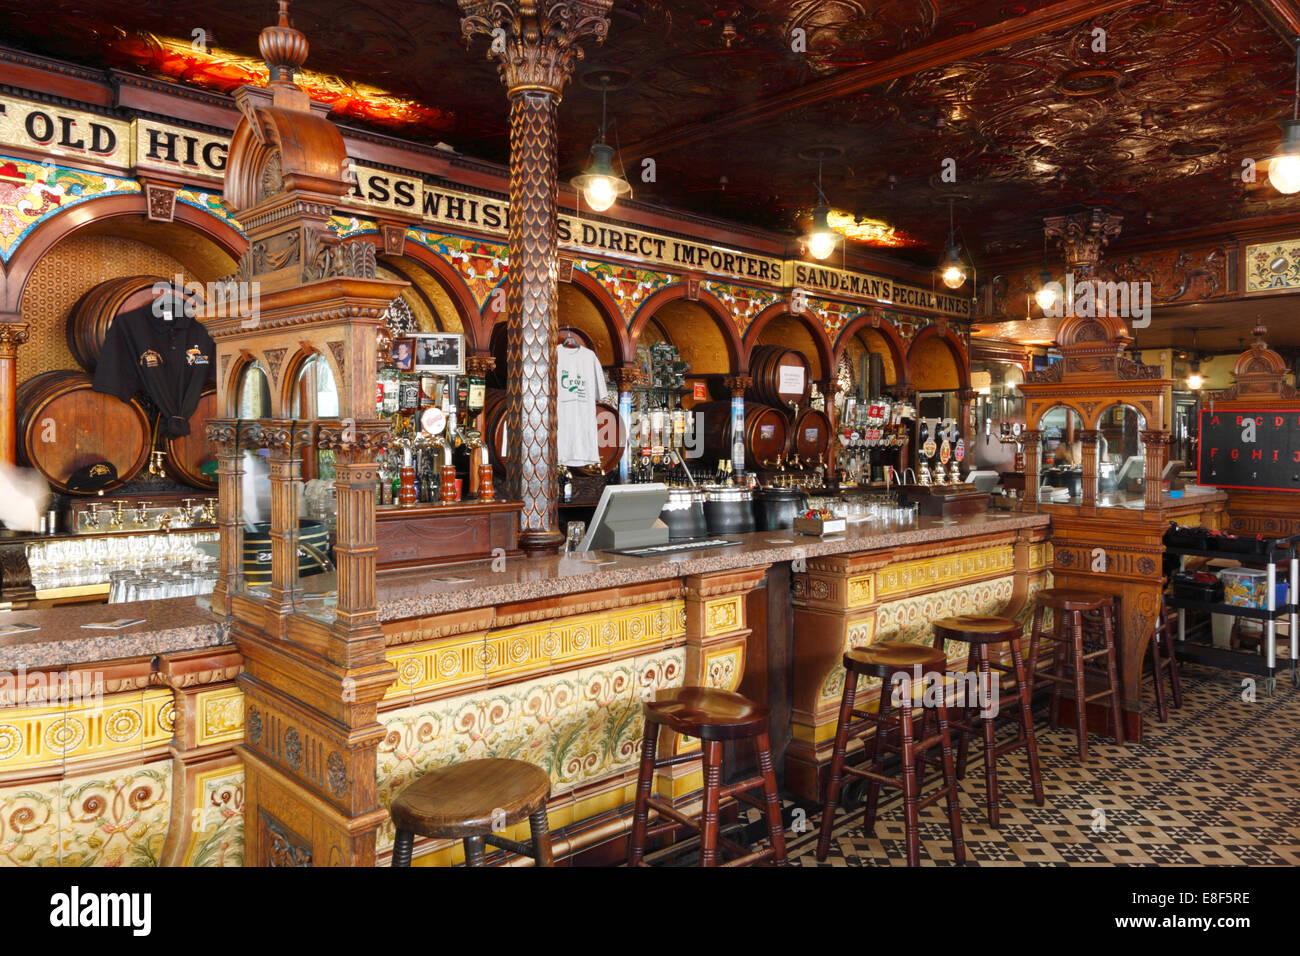 The Crown Liquor Saloon, Belfast, Northern Ireland, 2010. - Stock Image